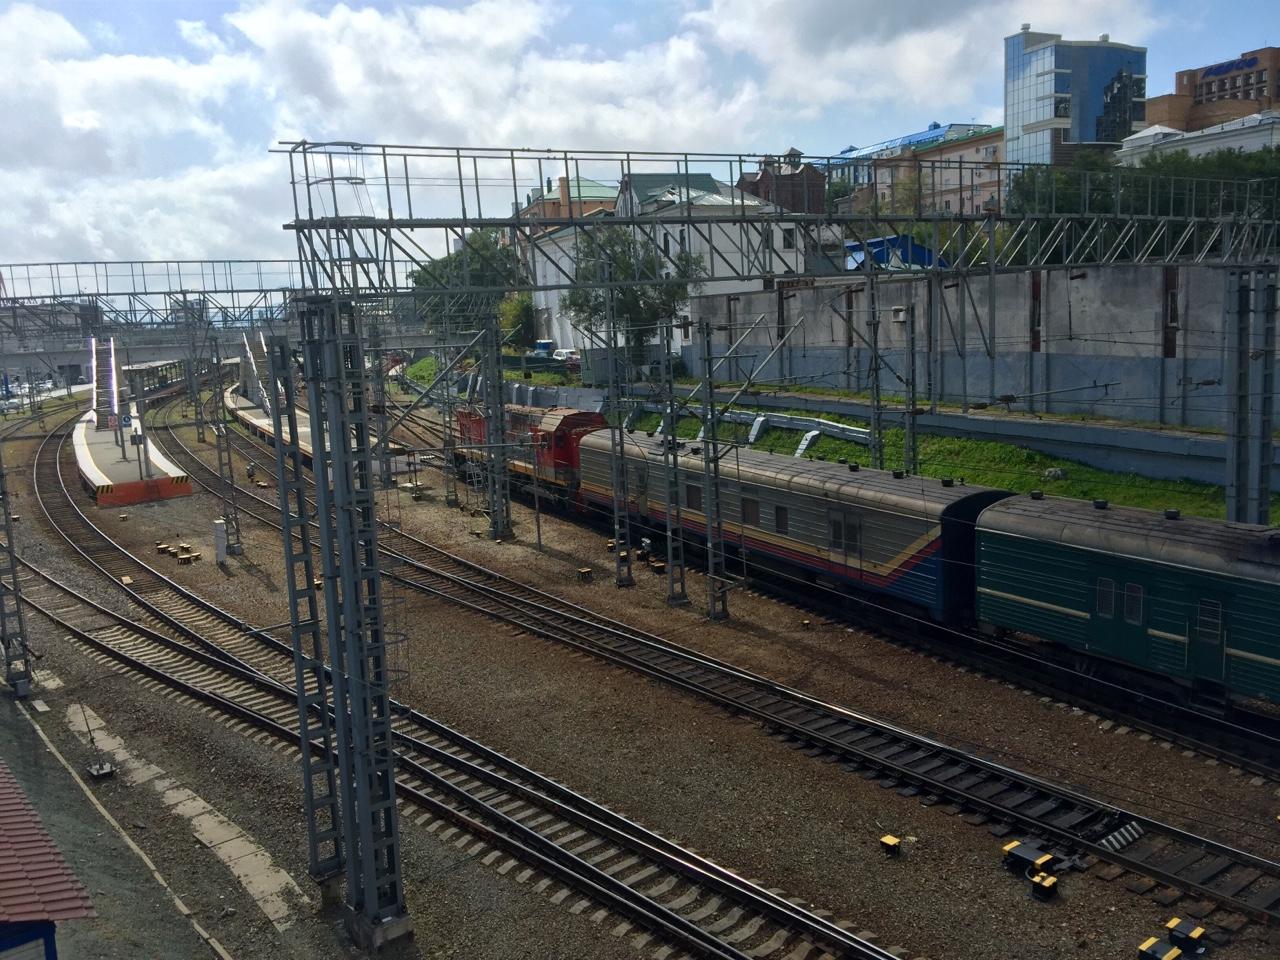 Vladivostok, Russia    Trains arriving into the Vladivostok railway terminal.